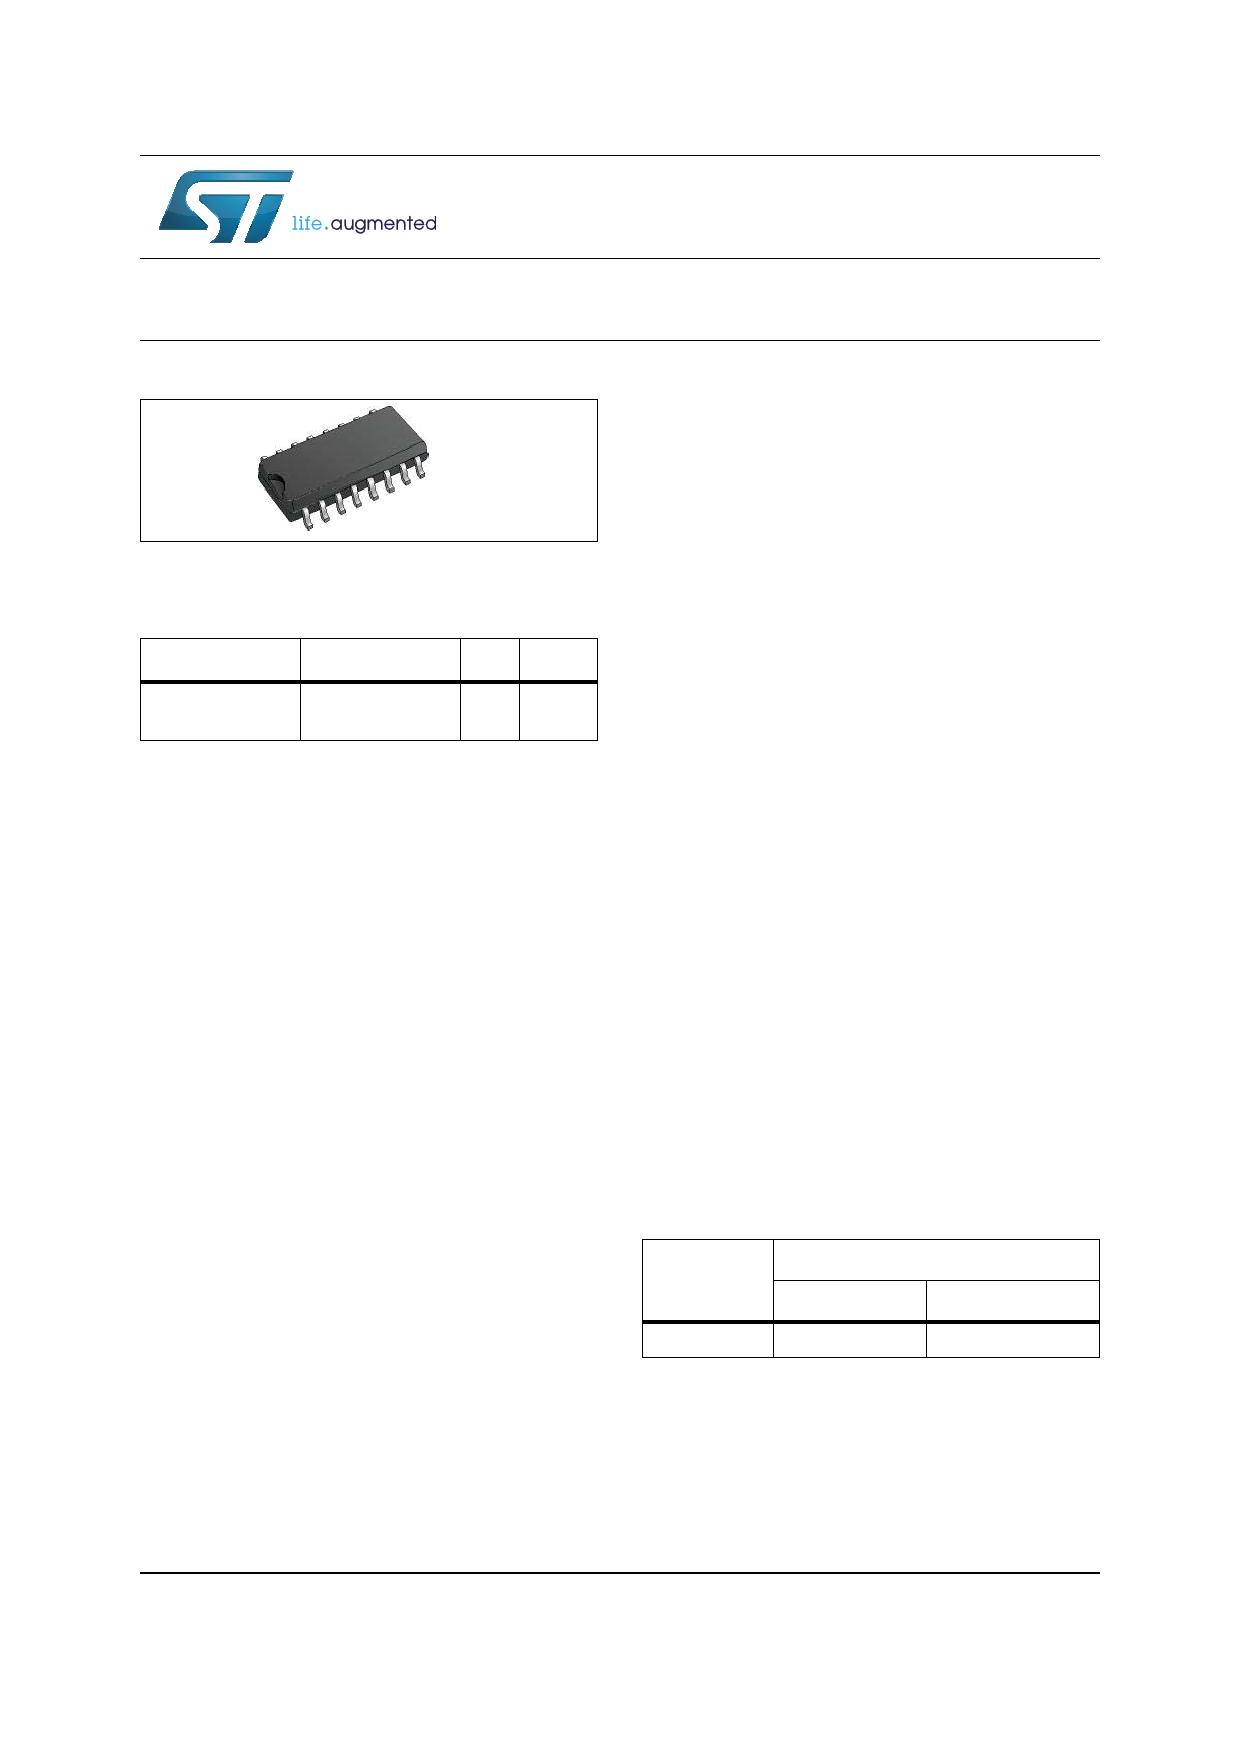 VNH7100AS-E datasheet, circuit